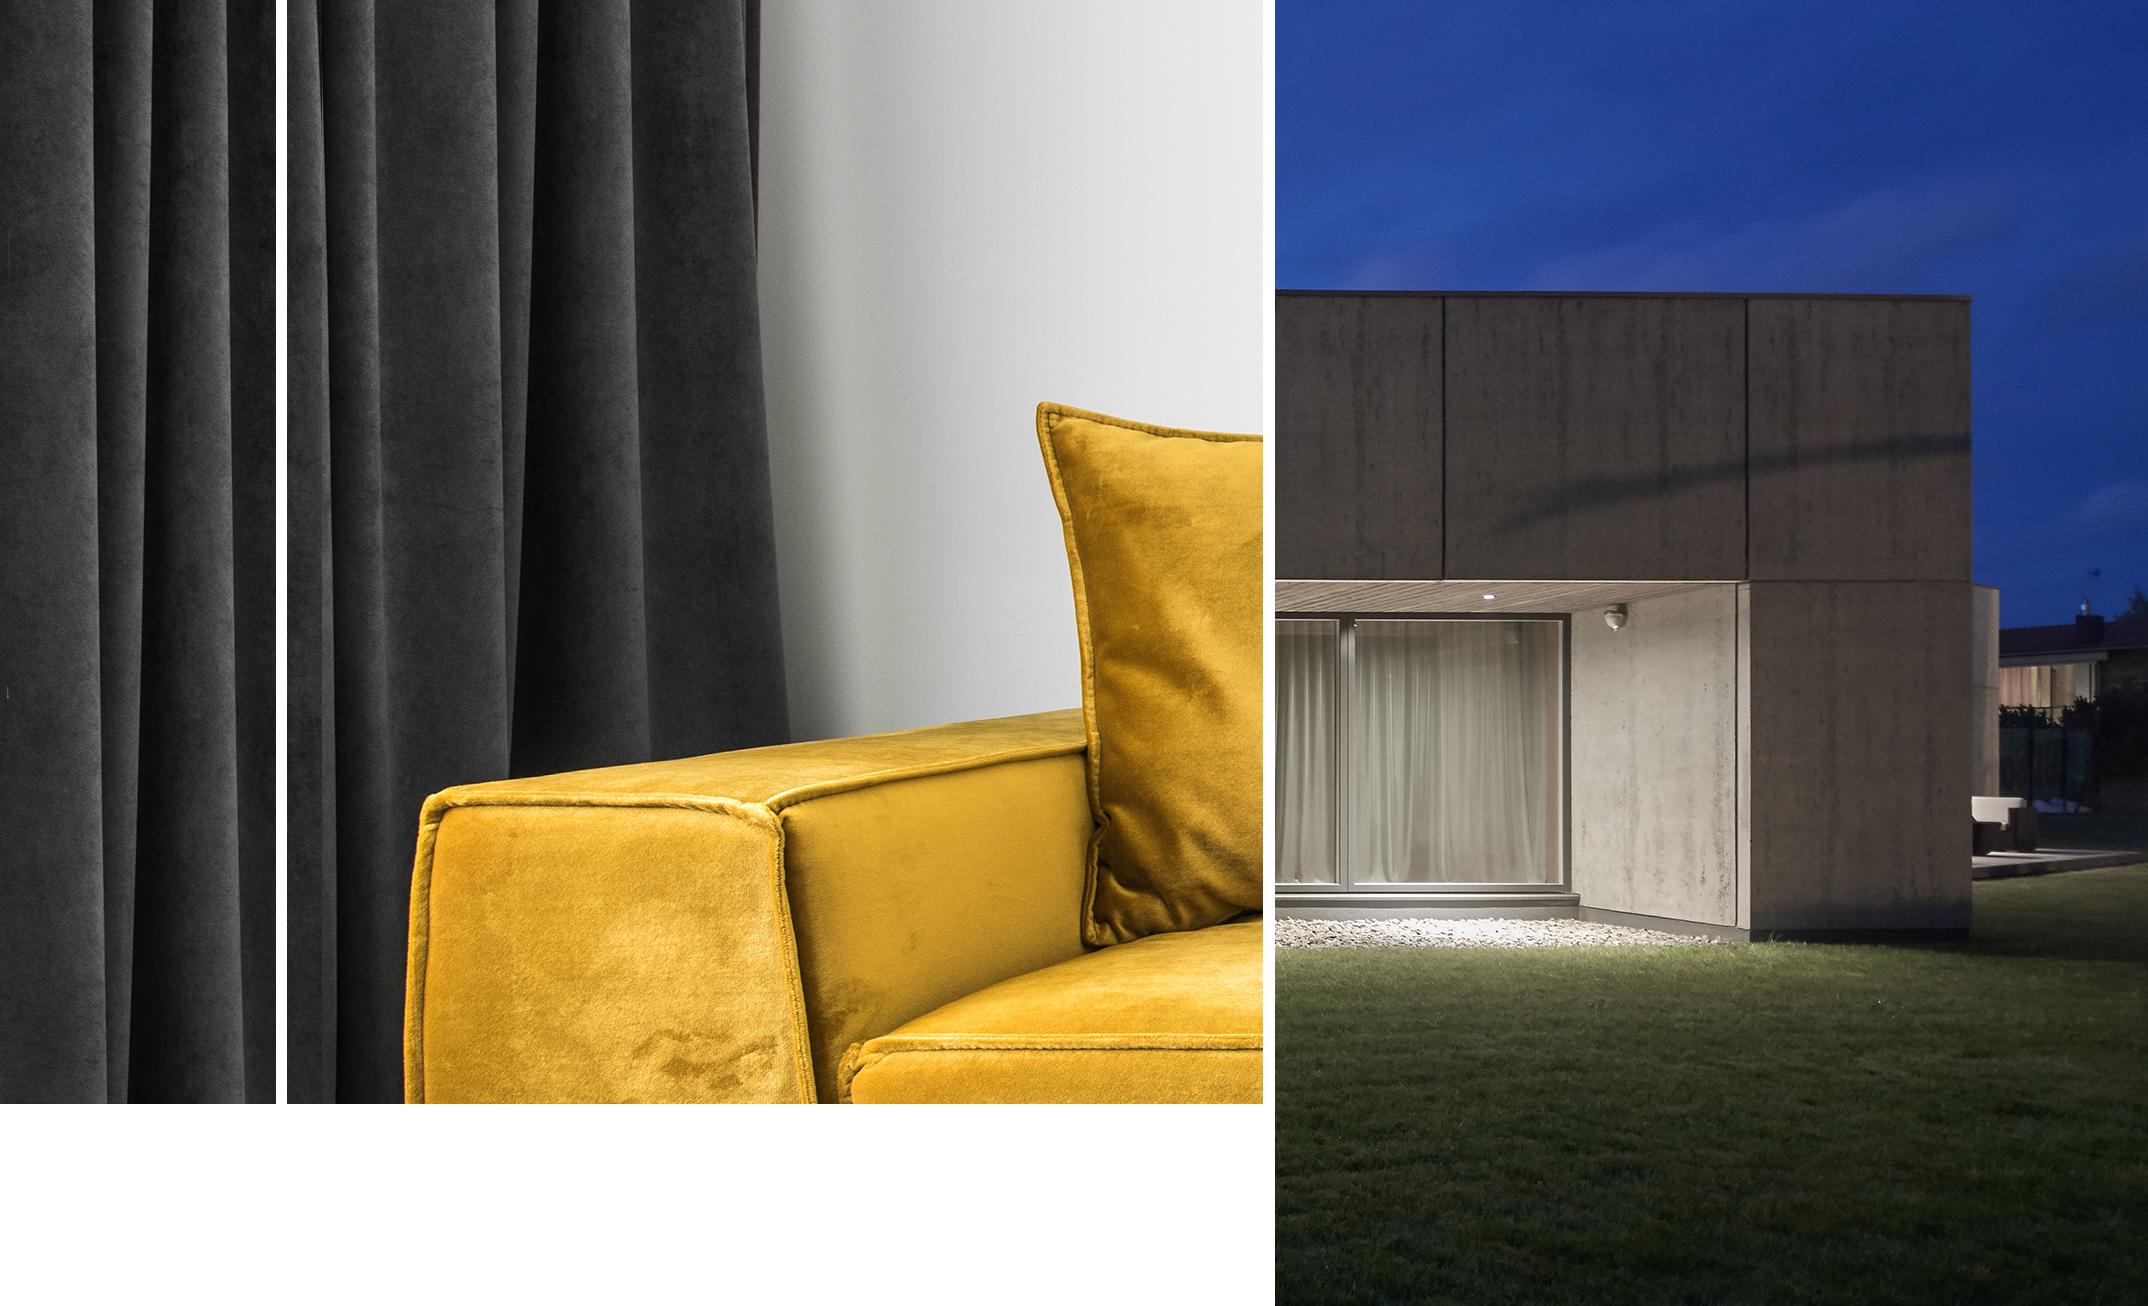 EJtekstile–-interjero-tekstiles-projektavimo-studija--Interior-textile-design-studio-6